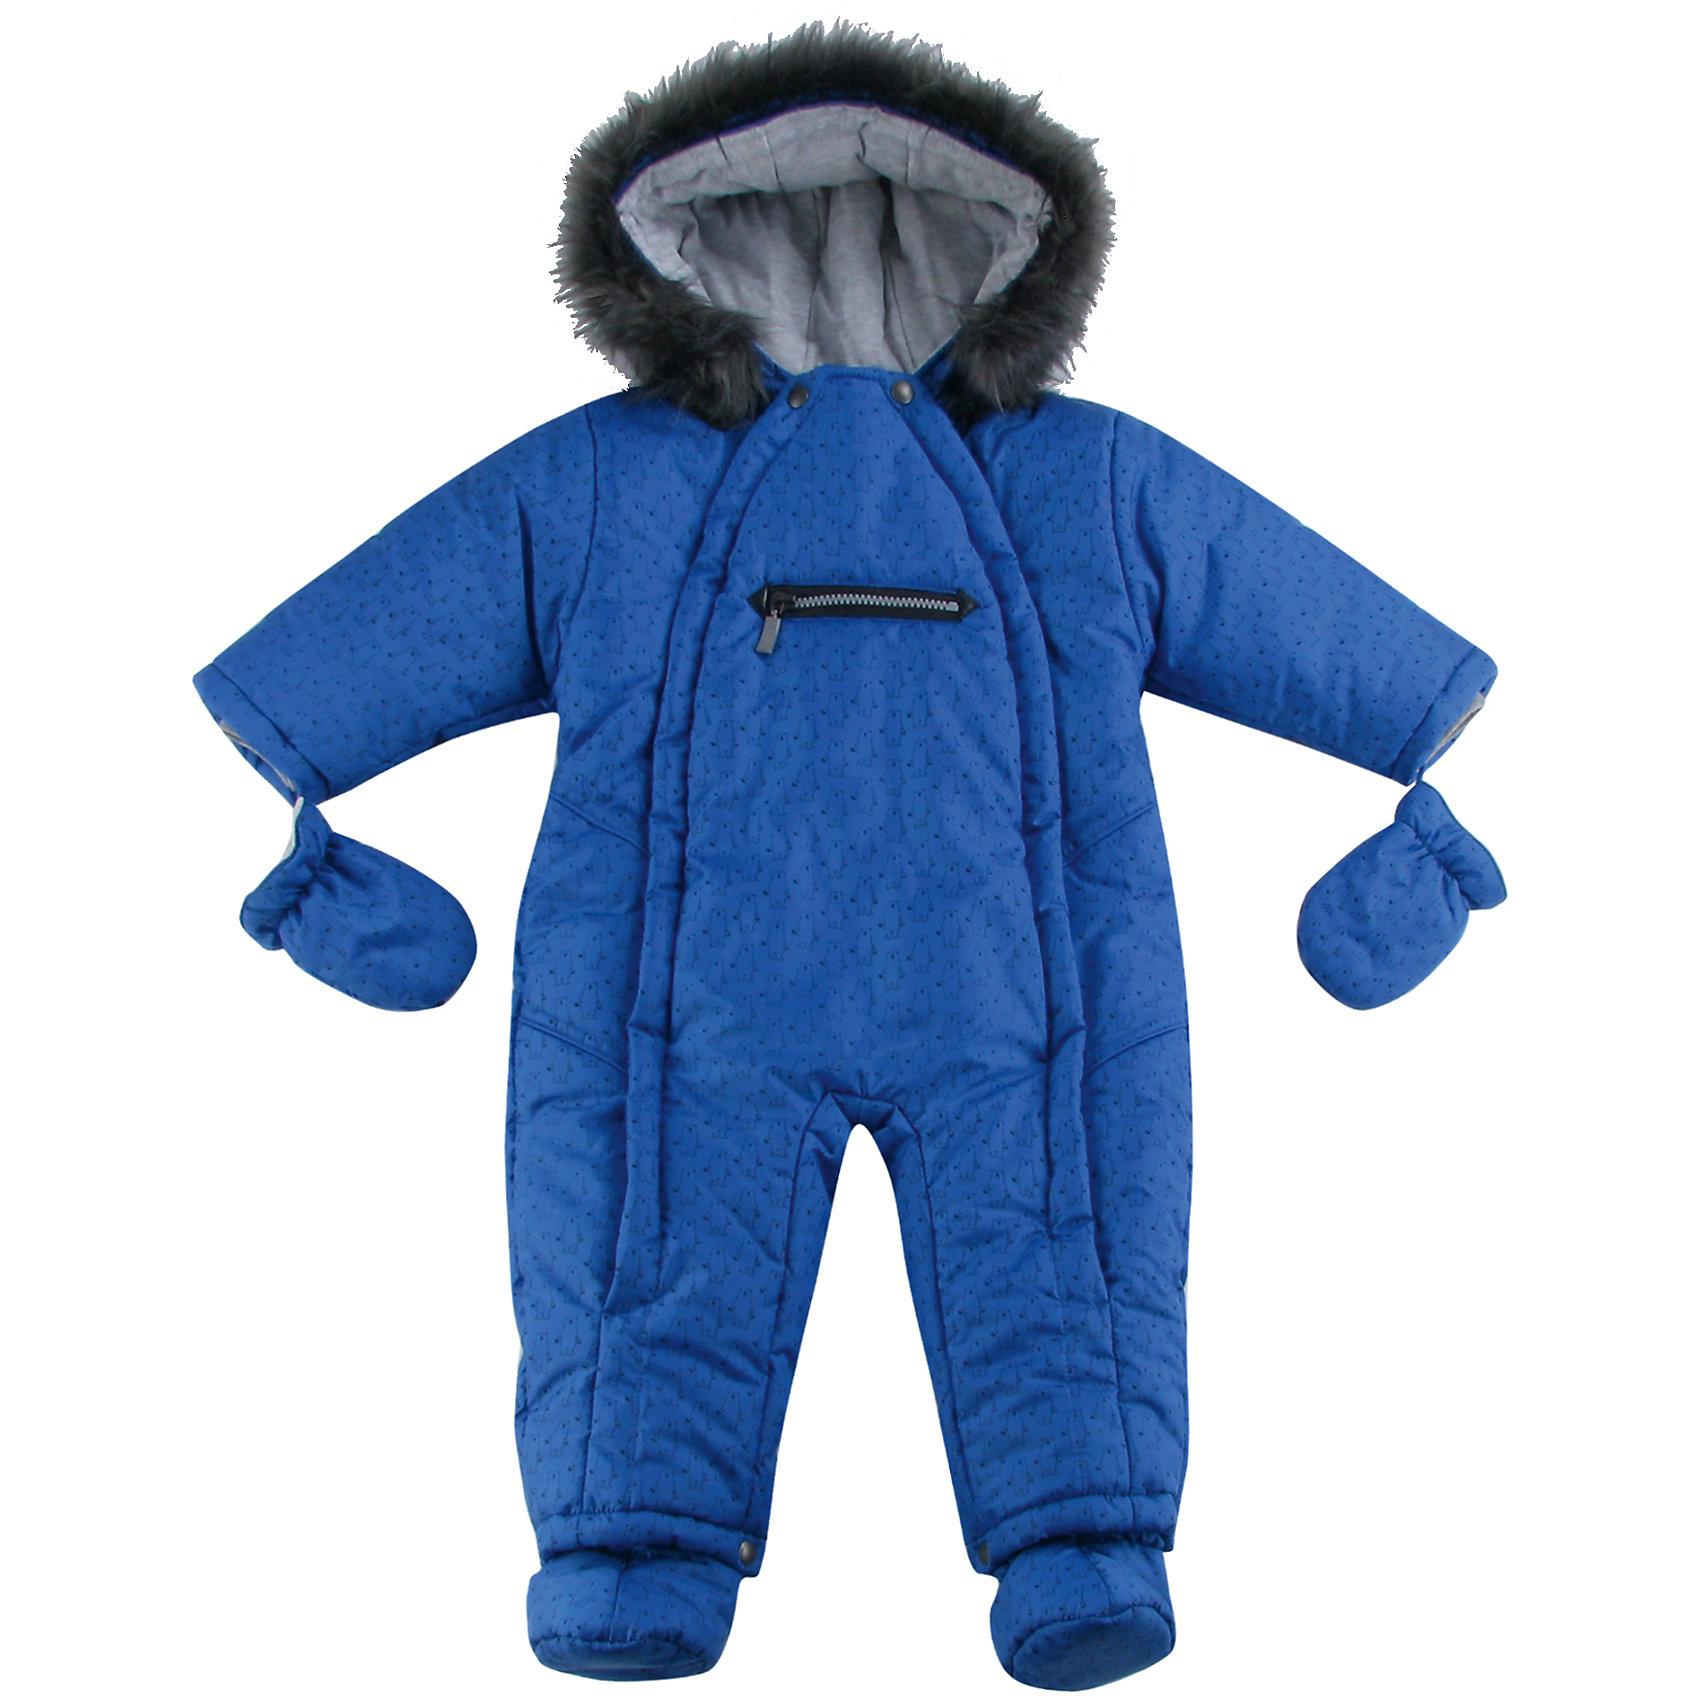 Комбинезон для мальчика WojcikВерхняя одежда<br>Комбинезон для мальчика Wojcik<br>Состав:<br>Полиэстер 100%<br><br>Ширина мм: 356<br>Глубина мм: 10<br>Высота мм: 245<br>Вес г: 519<br>Цвет: синий<br>Возраст от месяцев: 12<br>Возраст до месяцев: 15<br>Пол: Мужской<br>Возраст: Детский<br>Размер: 80,62,68,74<br>SKU: 5591836